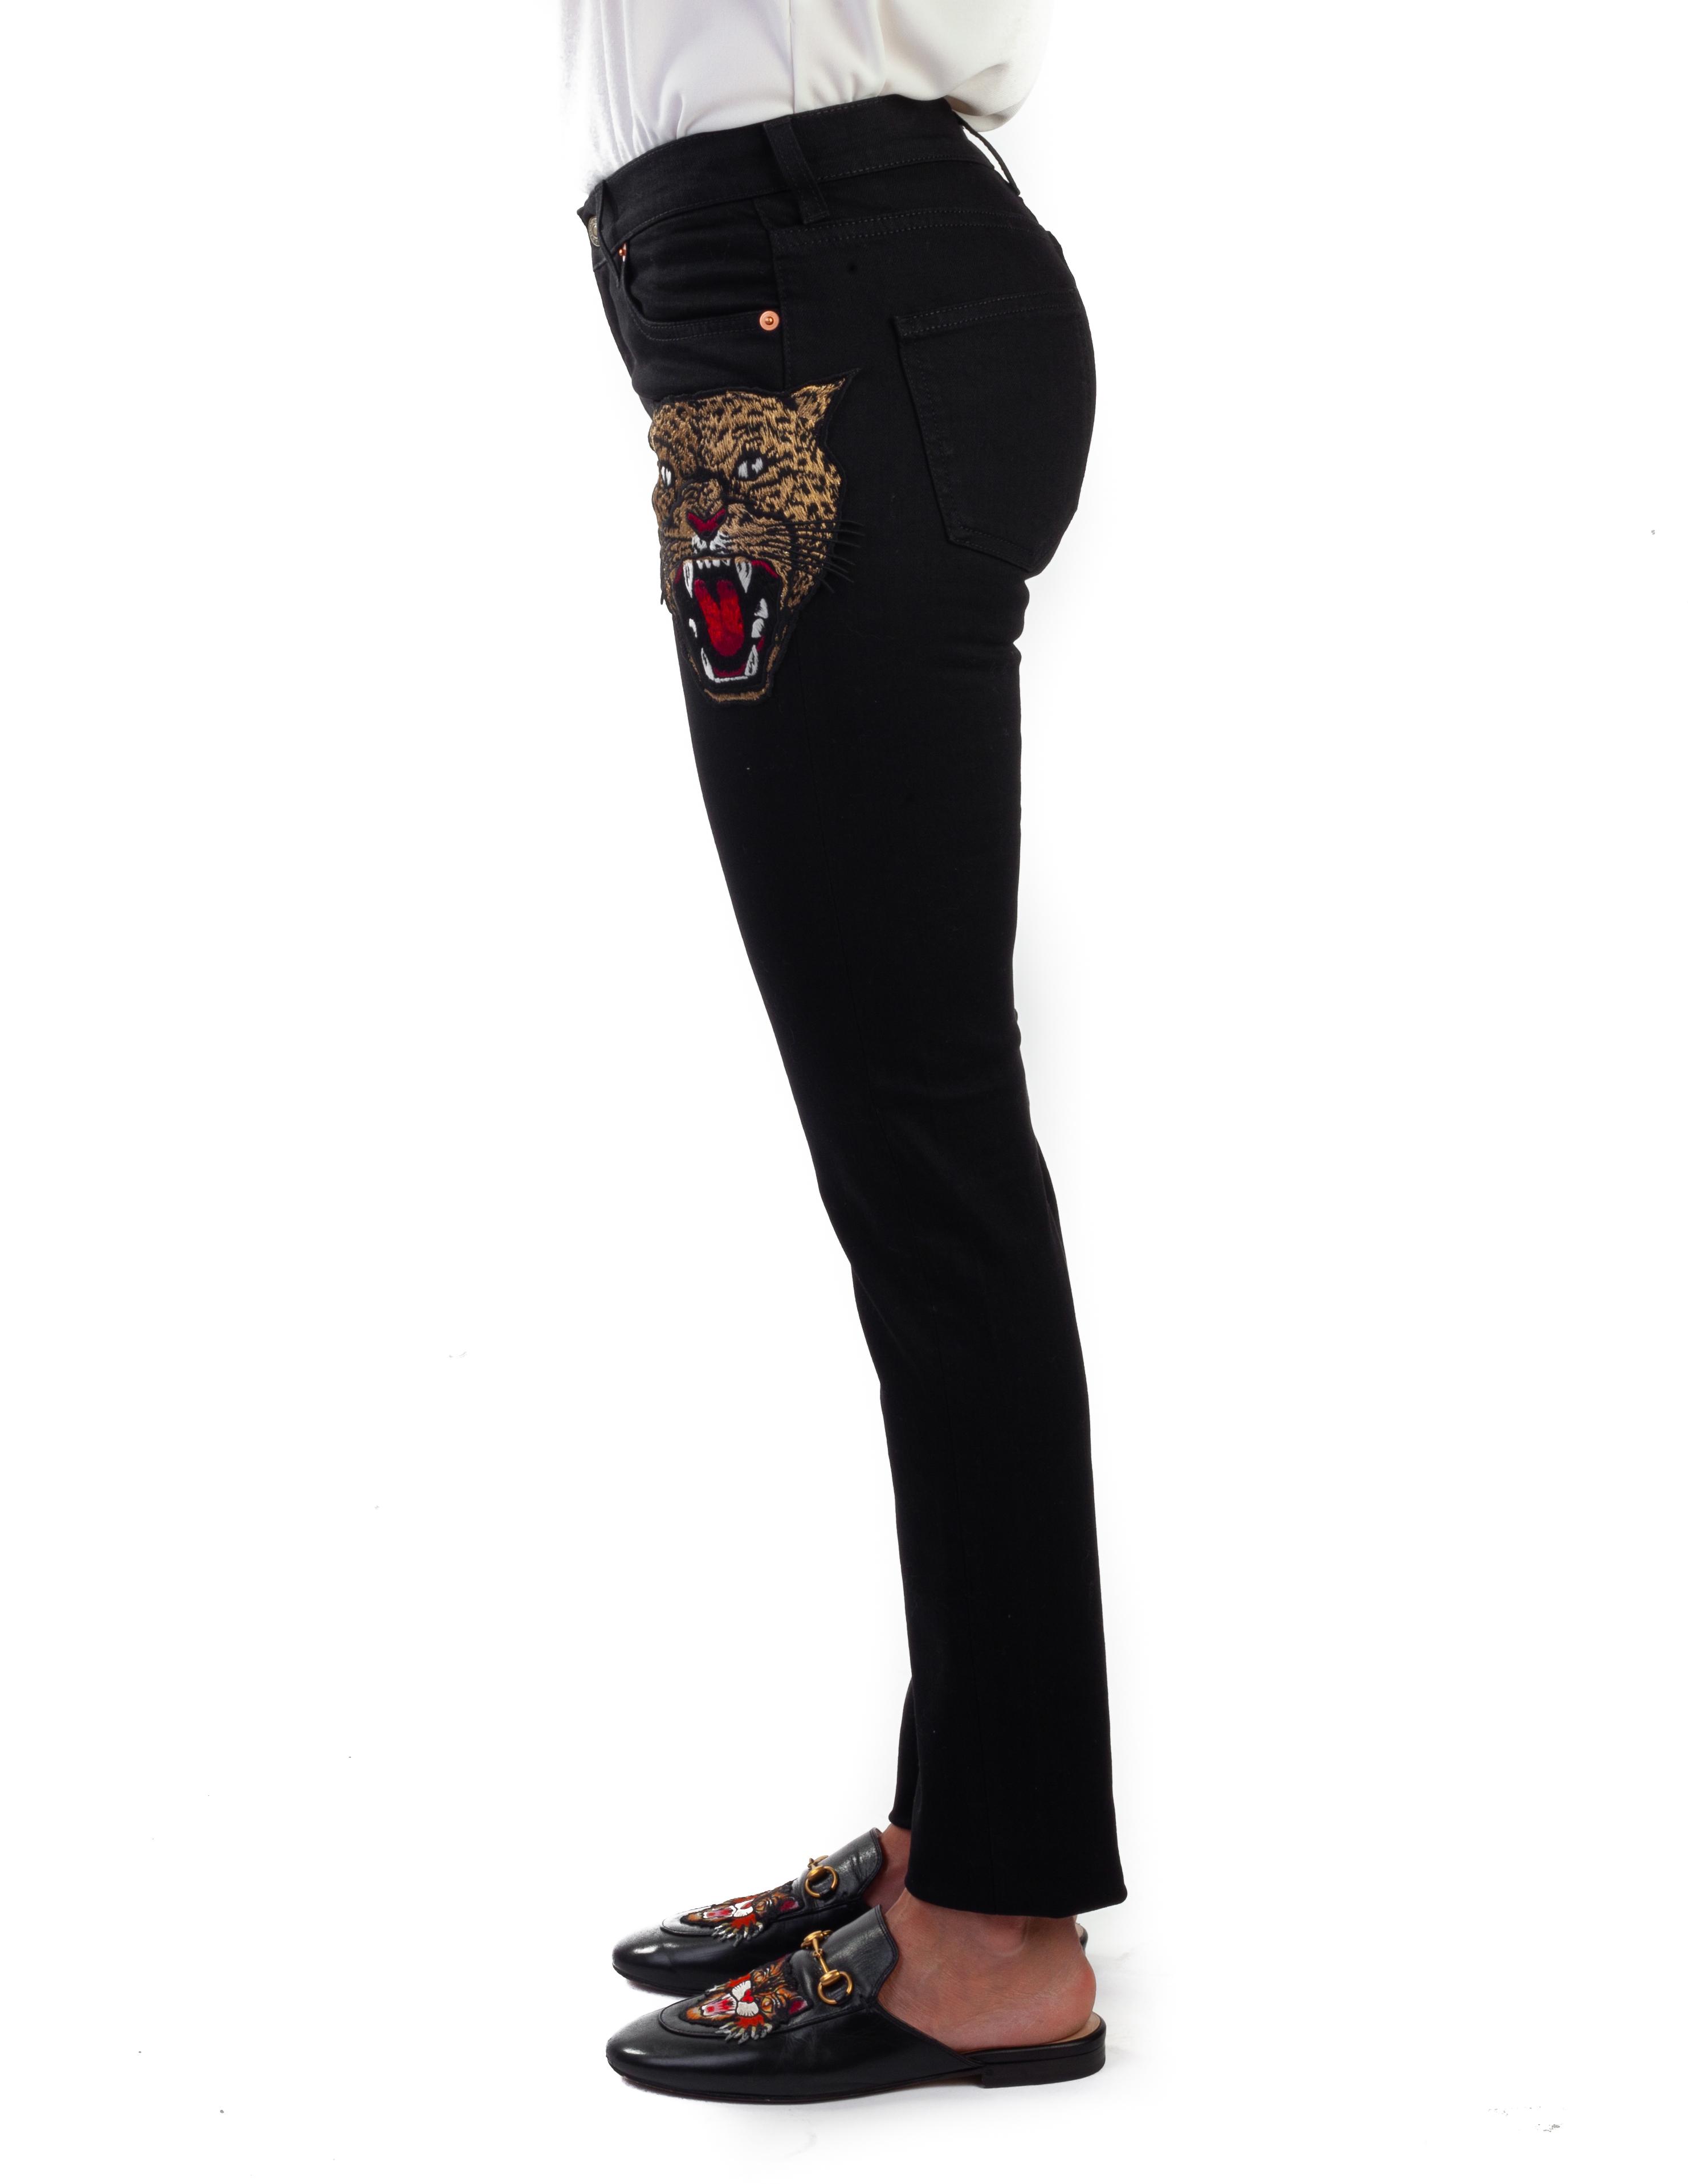 fbef4d0baf2f Cotone tigre ricamata Applique Denim Jeans Gucci donna pantaloni neri